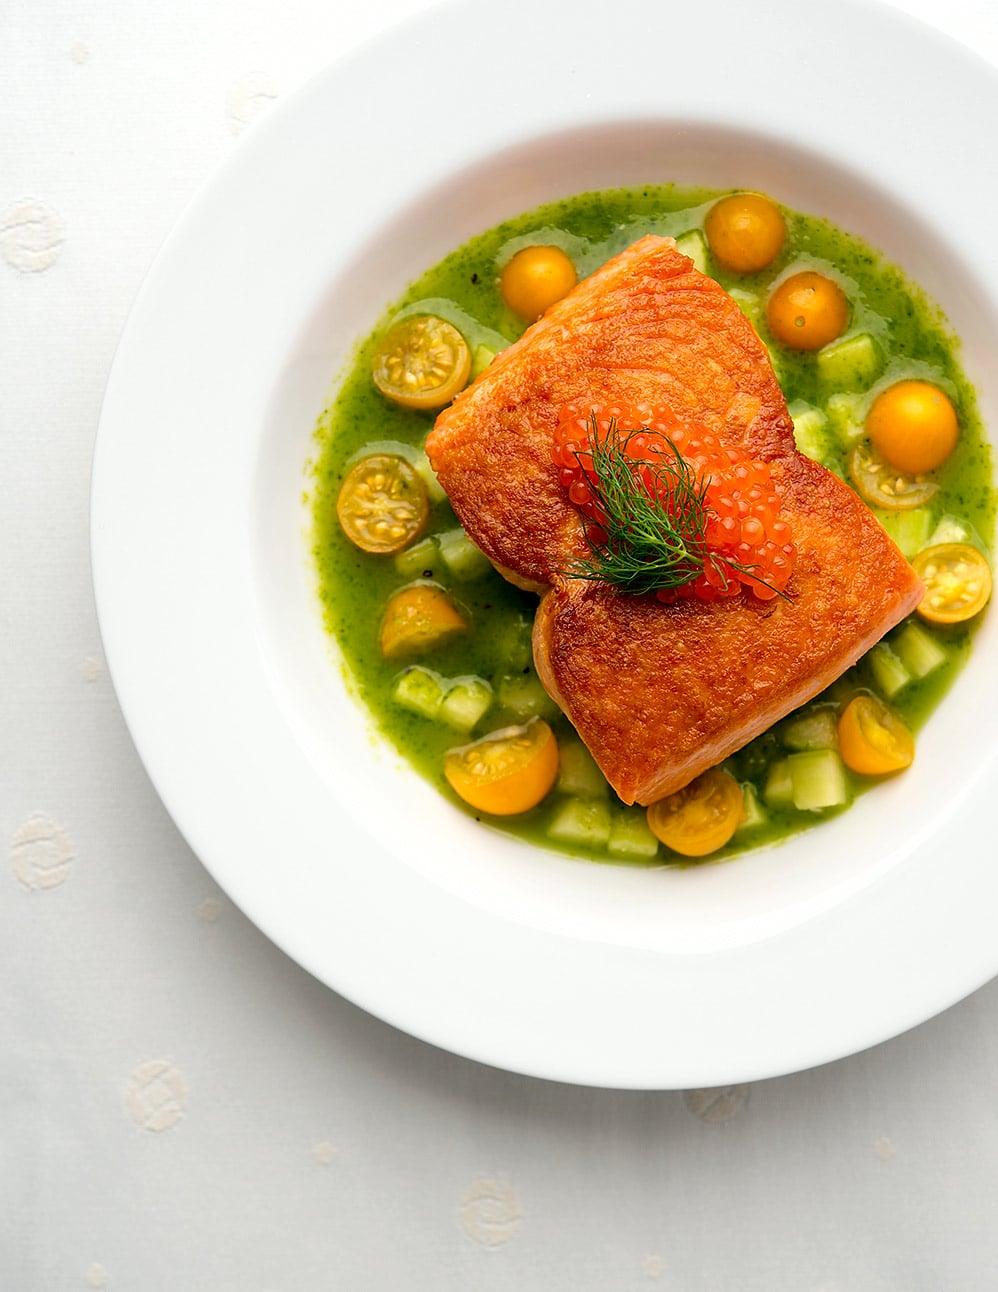 Seared salmon with cucumber sauce